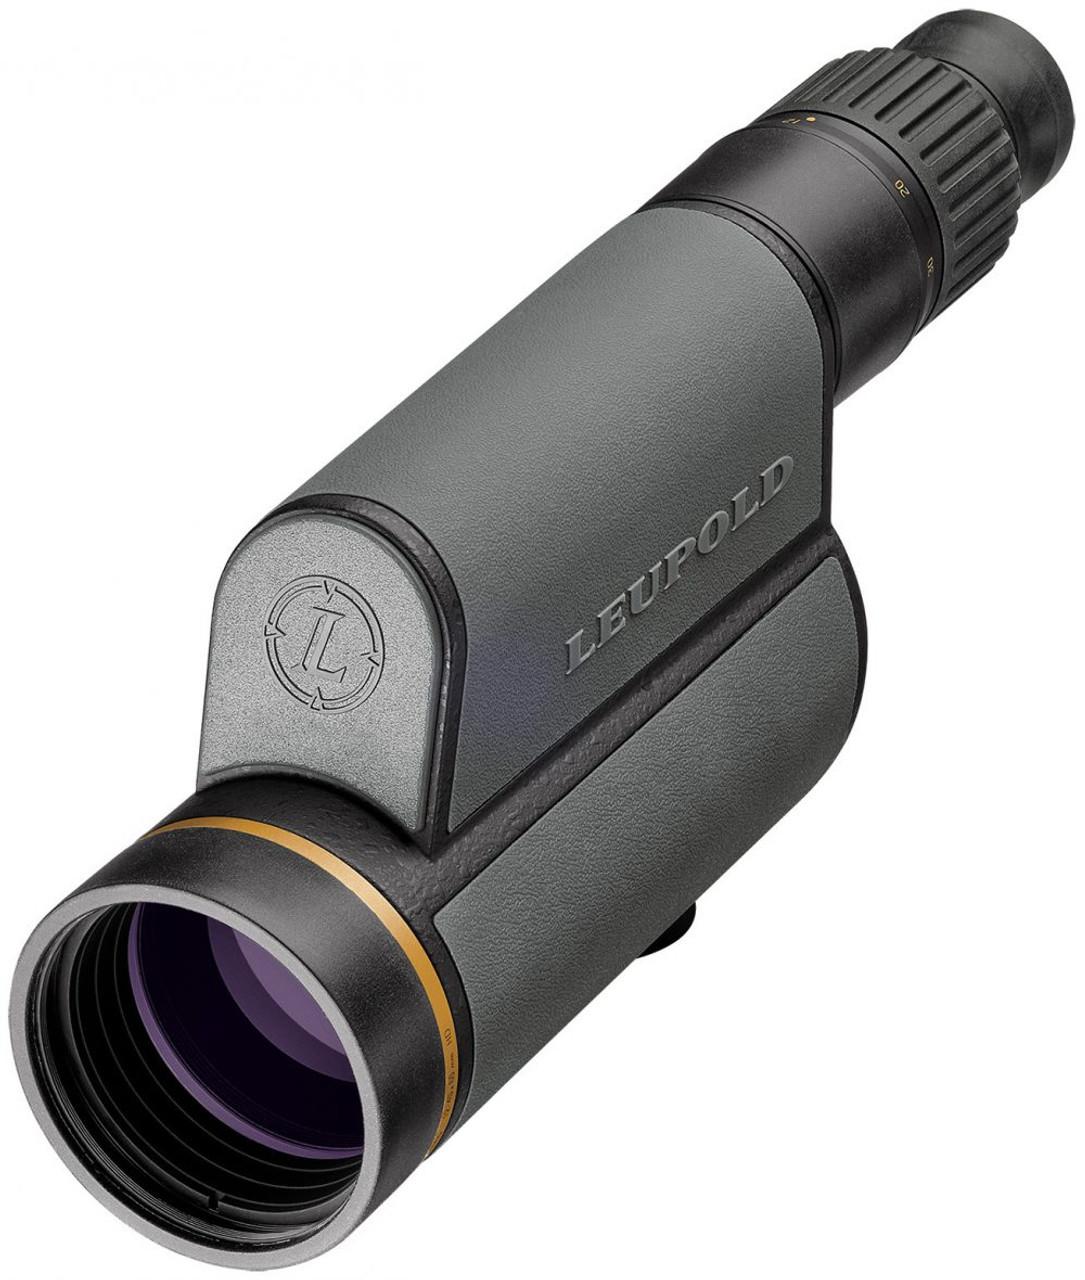 Leupold 120373 GR 12-40x60 HD Spotting Scope Shadow Grey Impact Reticle 030317006730